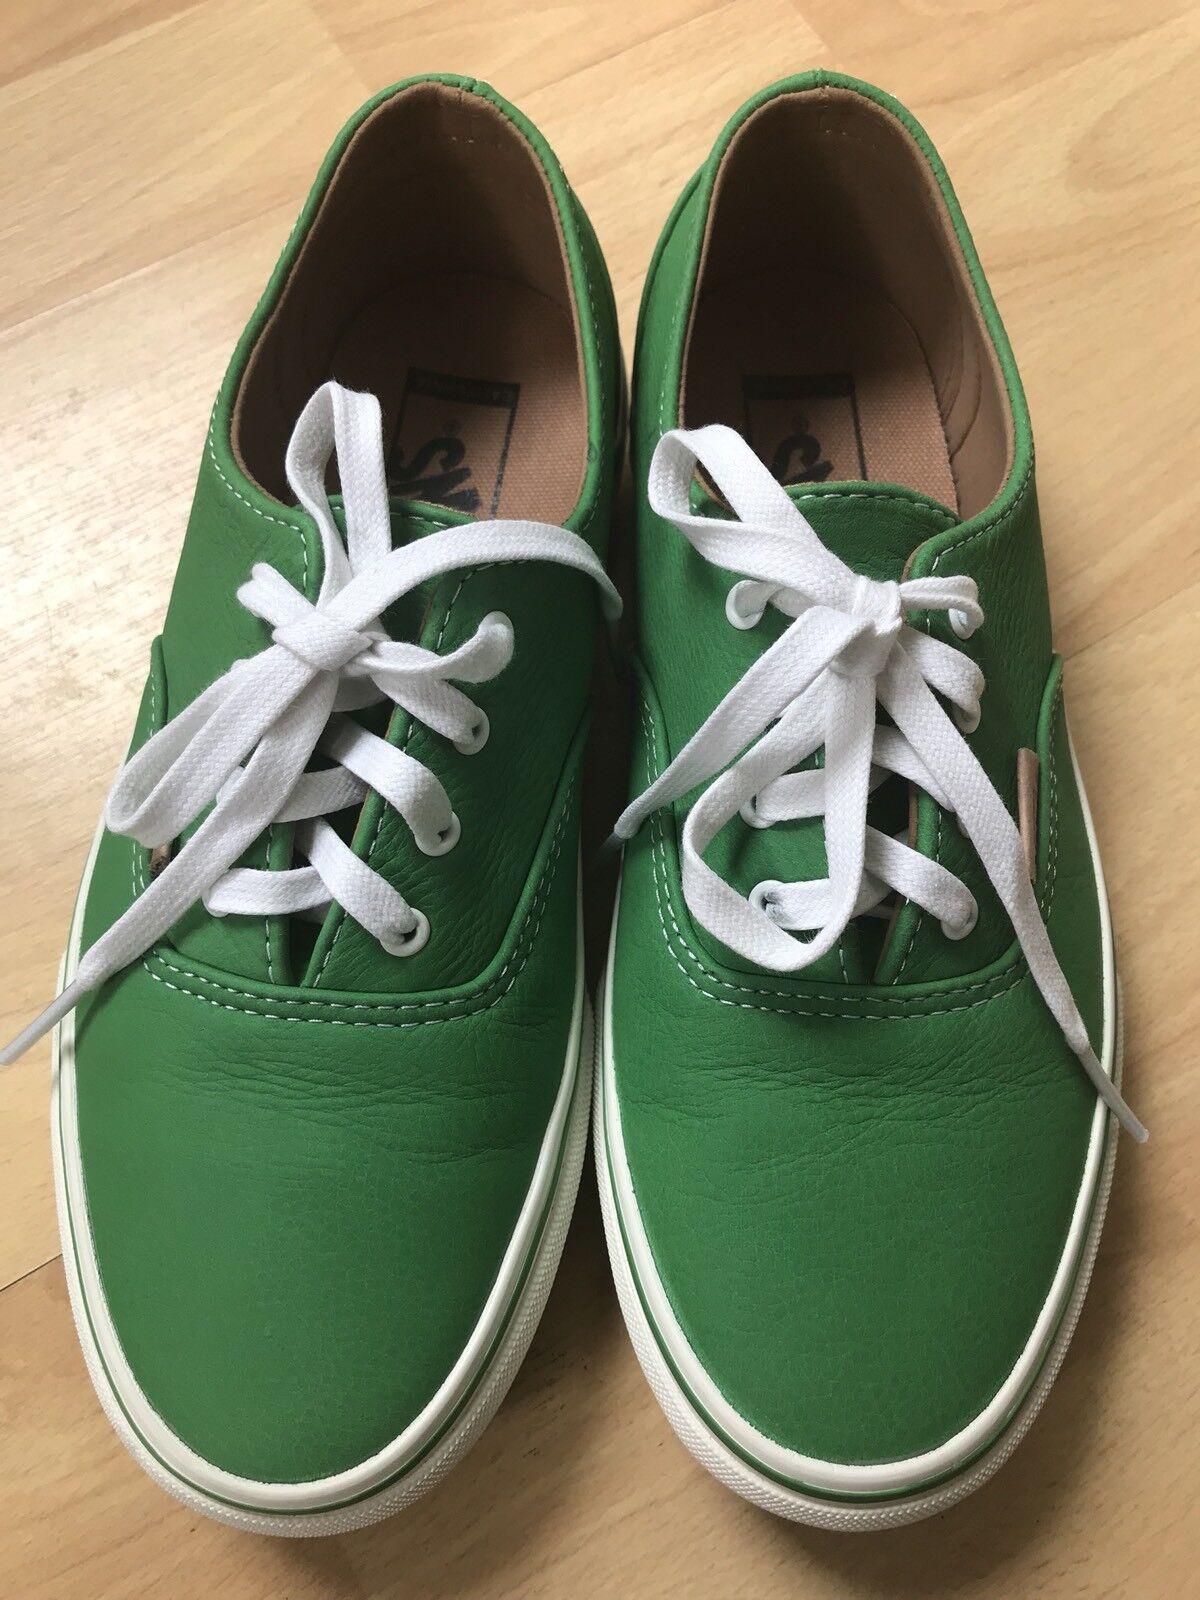 Vans Ladies Green Leather shoes  37